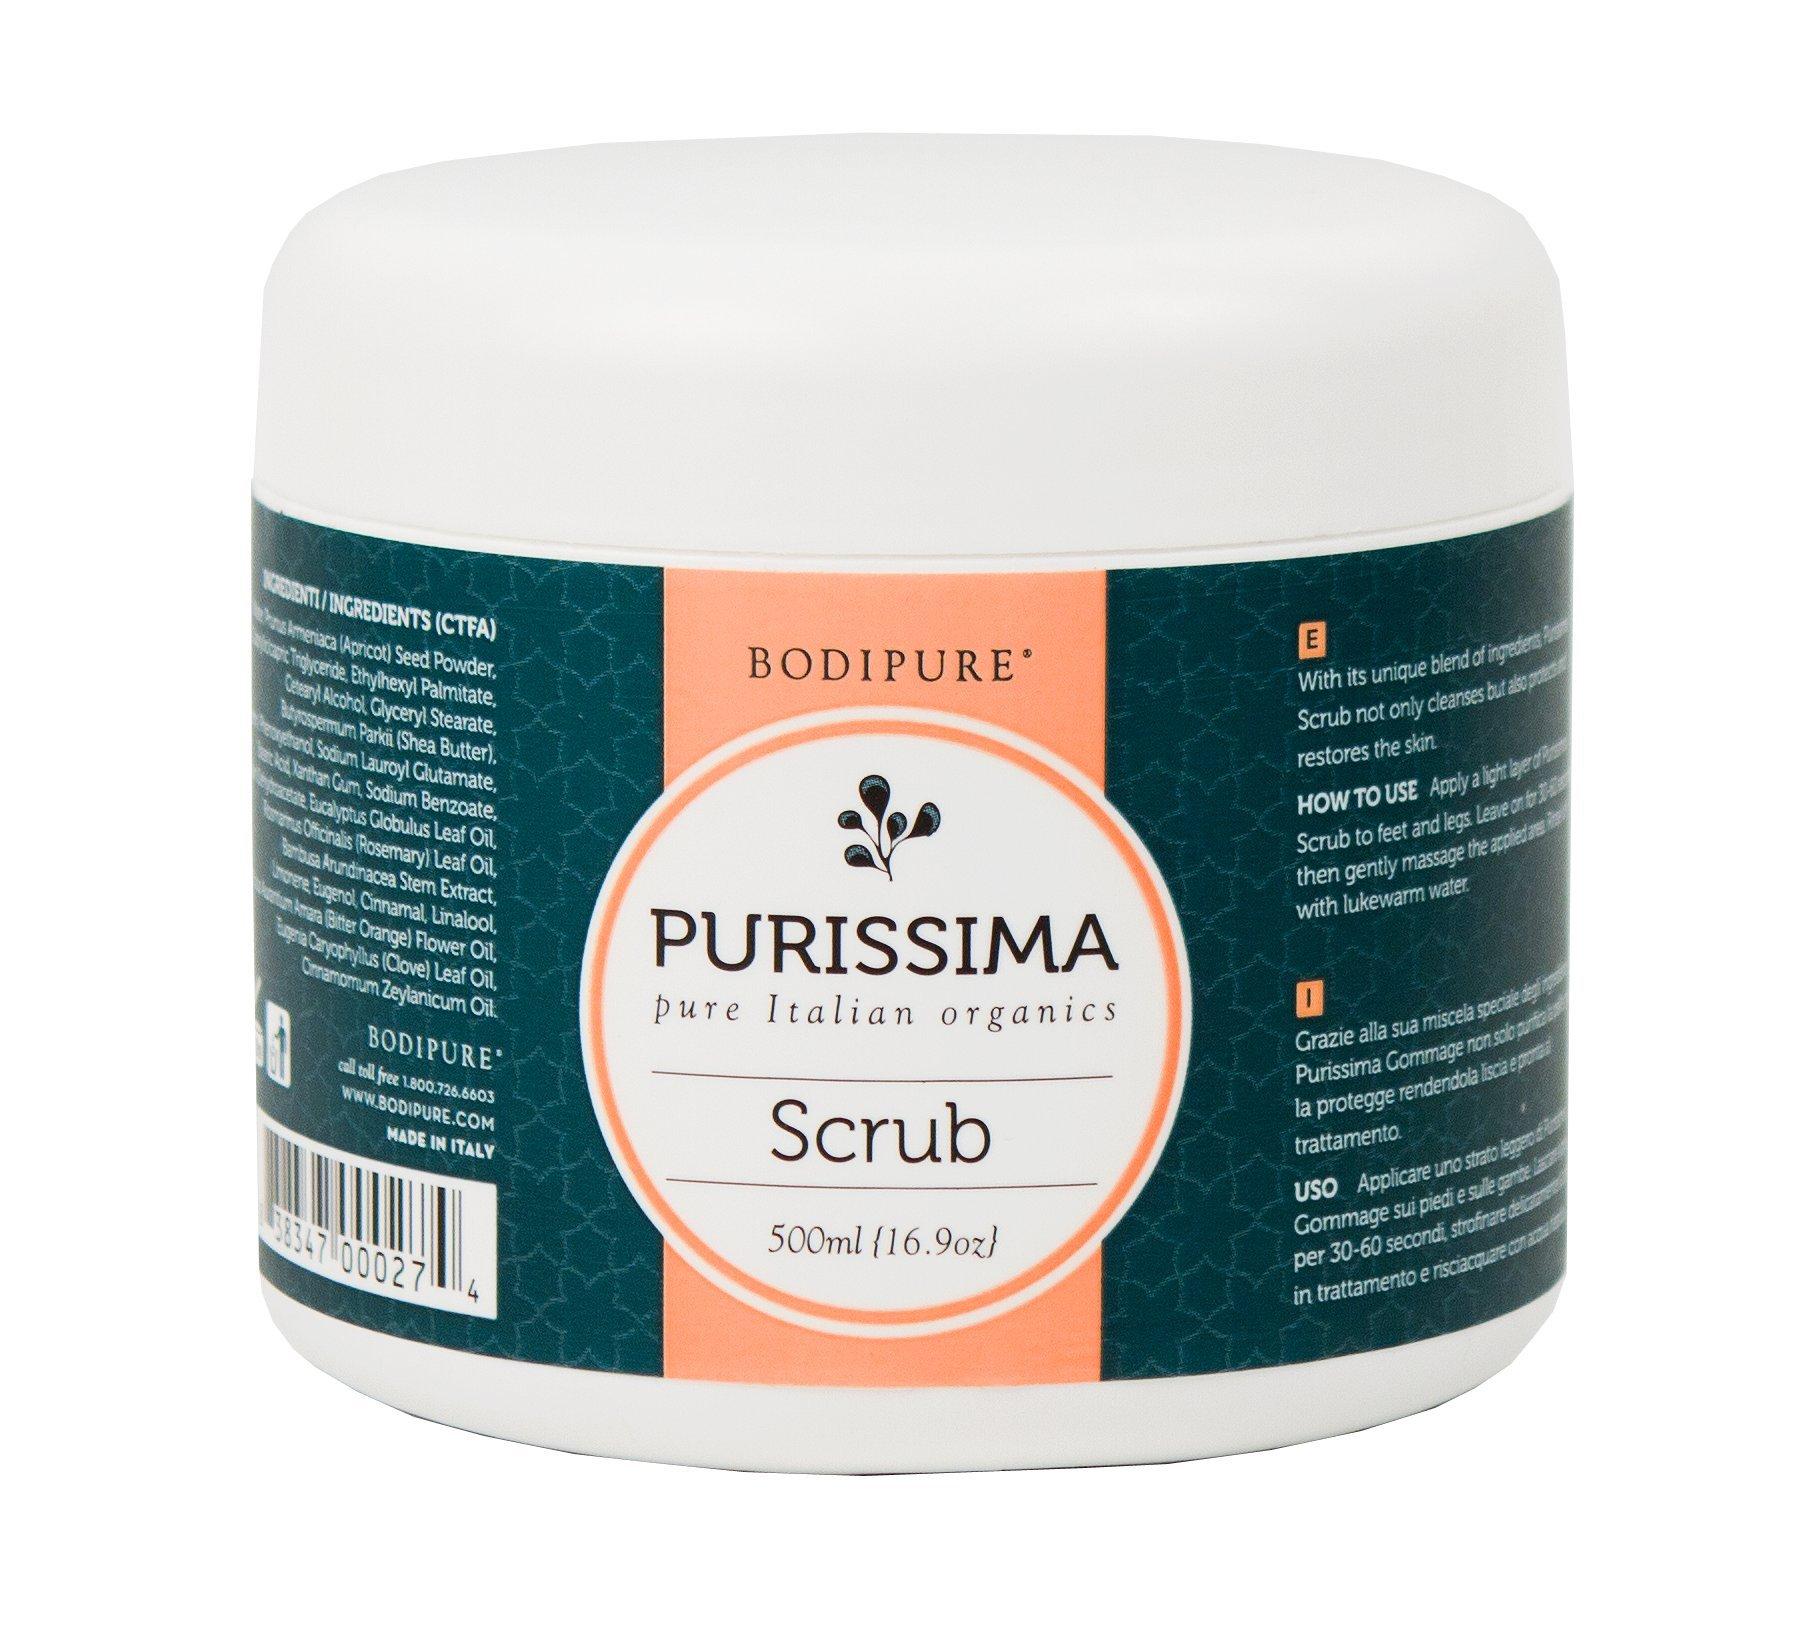 Purissima Organic Scrub from Italy-500ml